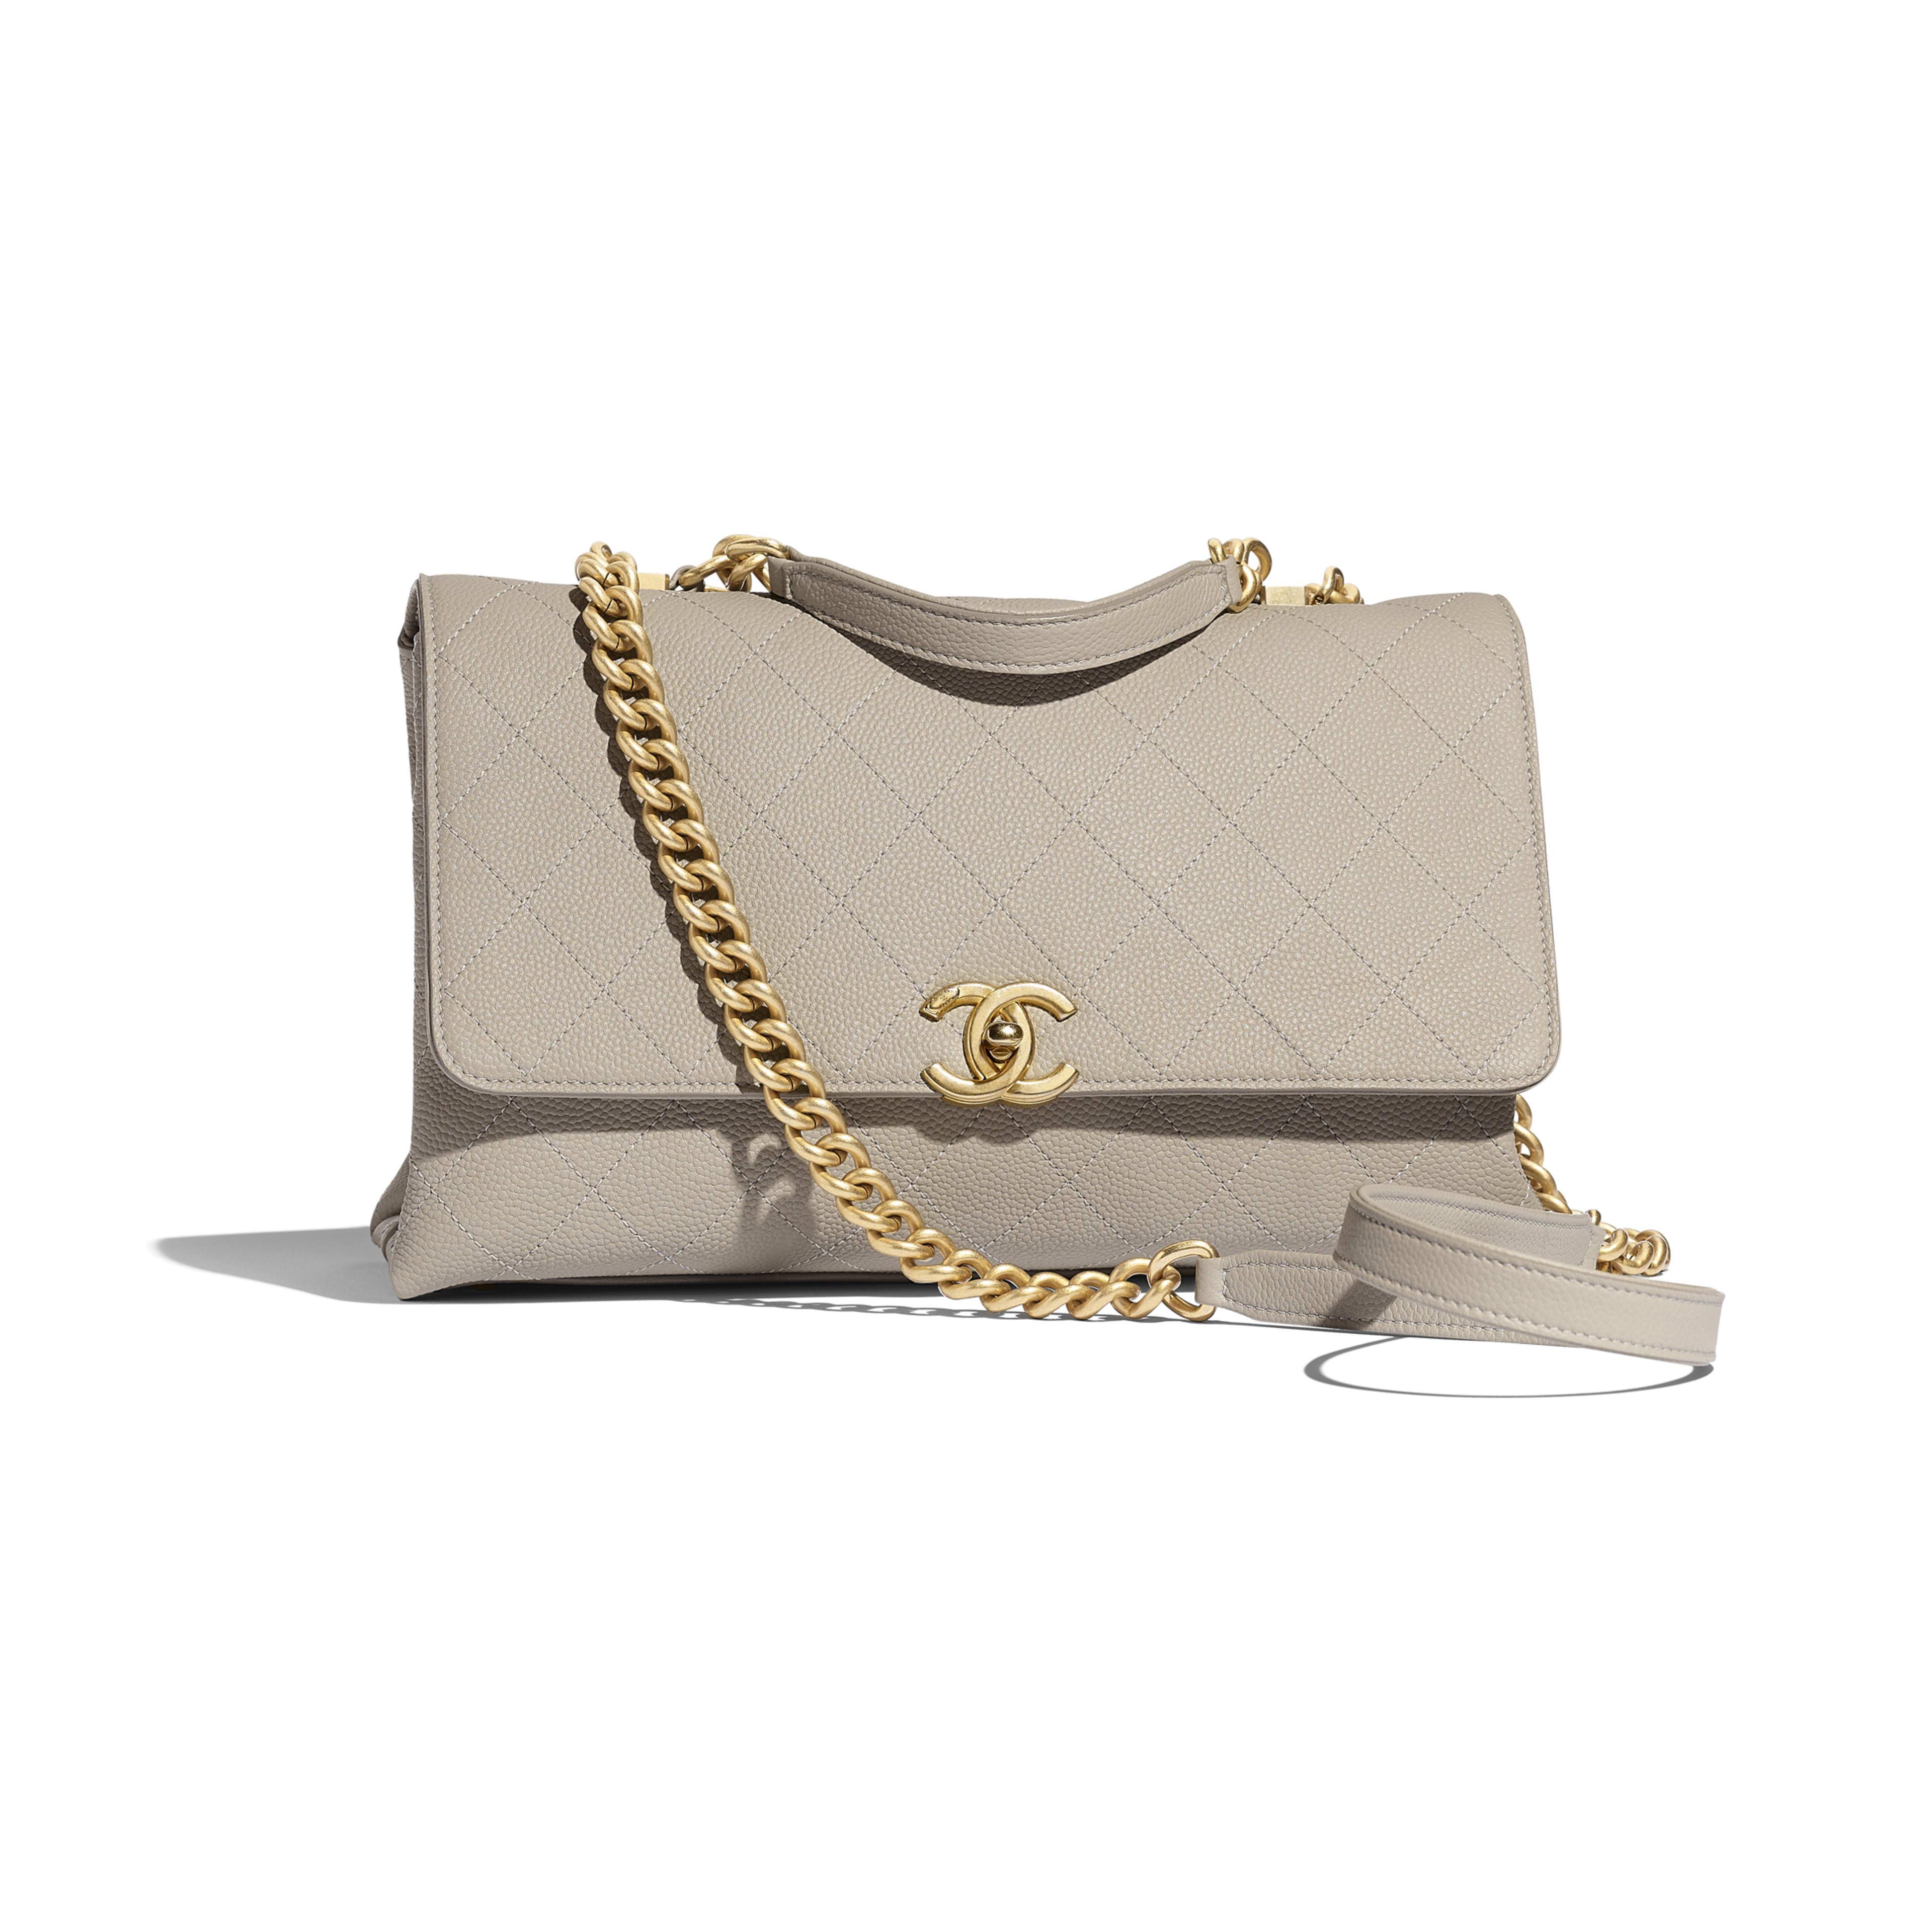 54fc332f3f Flap Bag - Gray - Grained Calfskin   Gold-Tone Metal - Default view ...